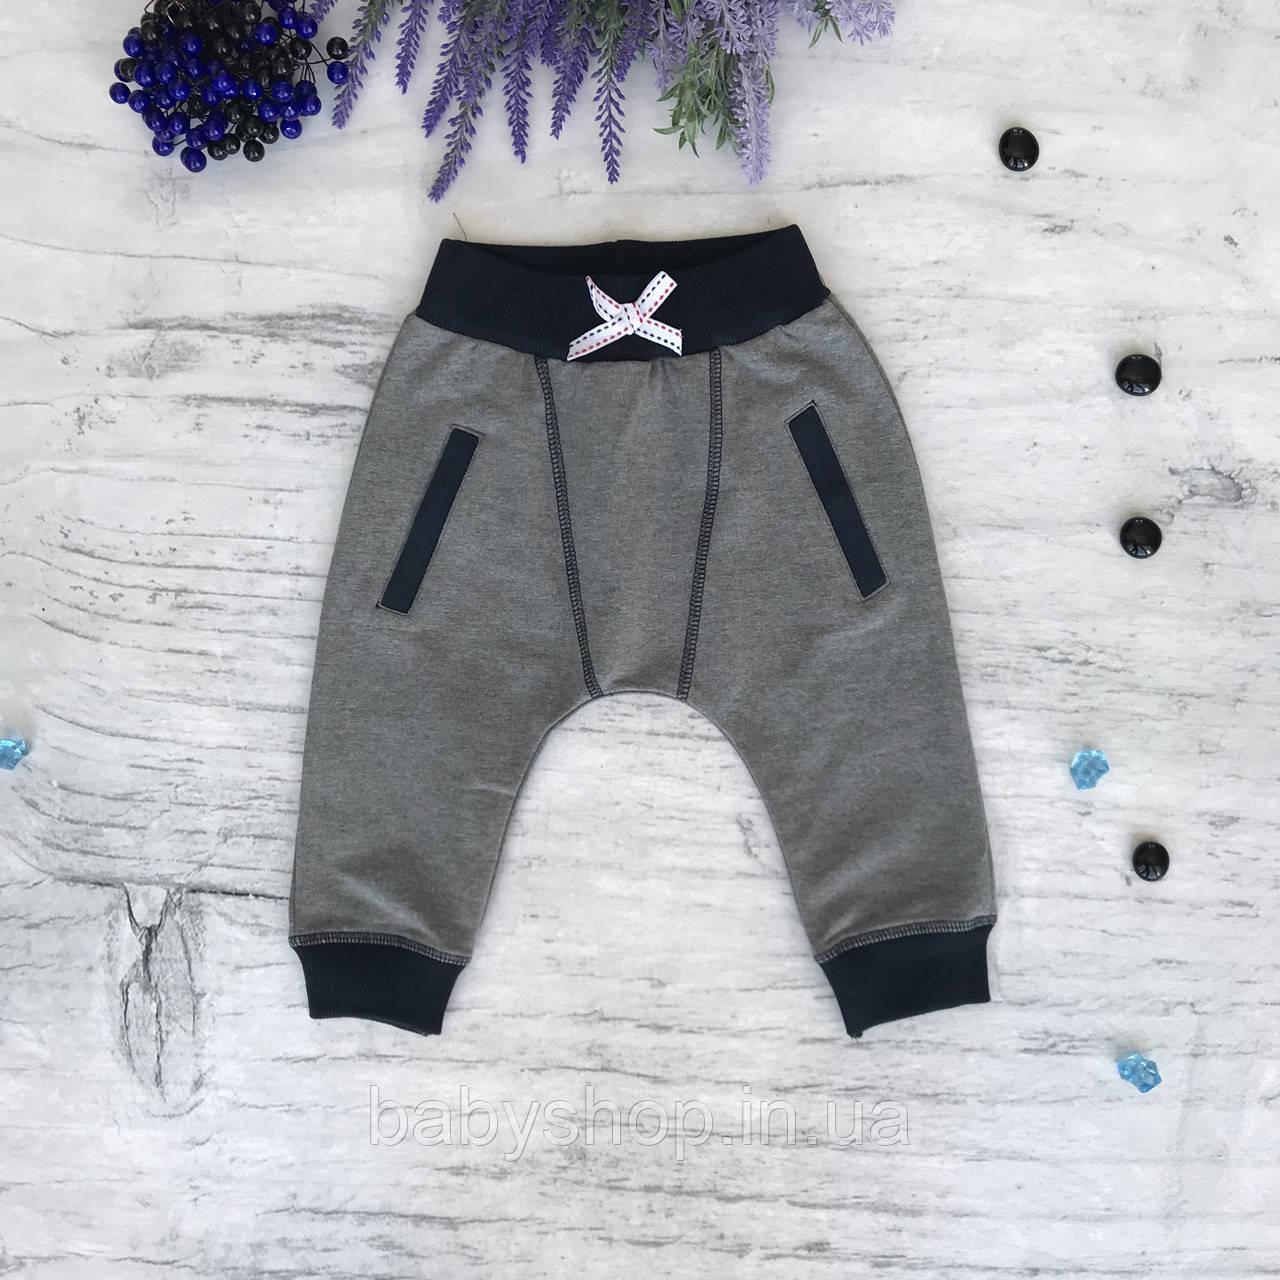 Штаны для мальчика Breeze 15. Размер 86 см